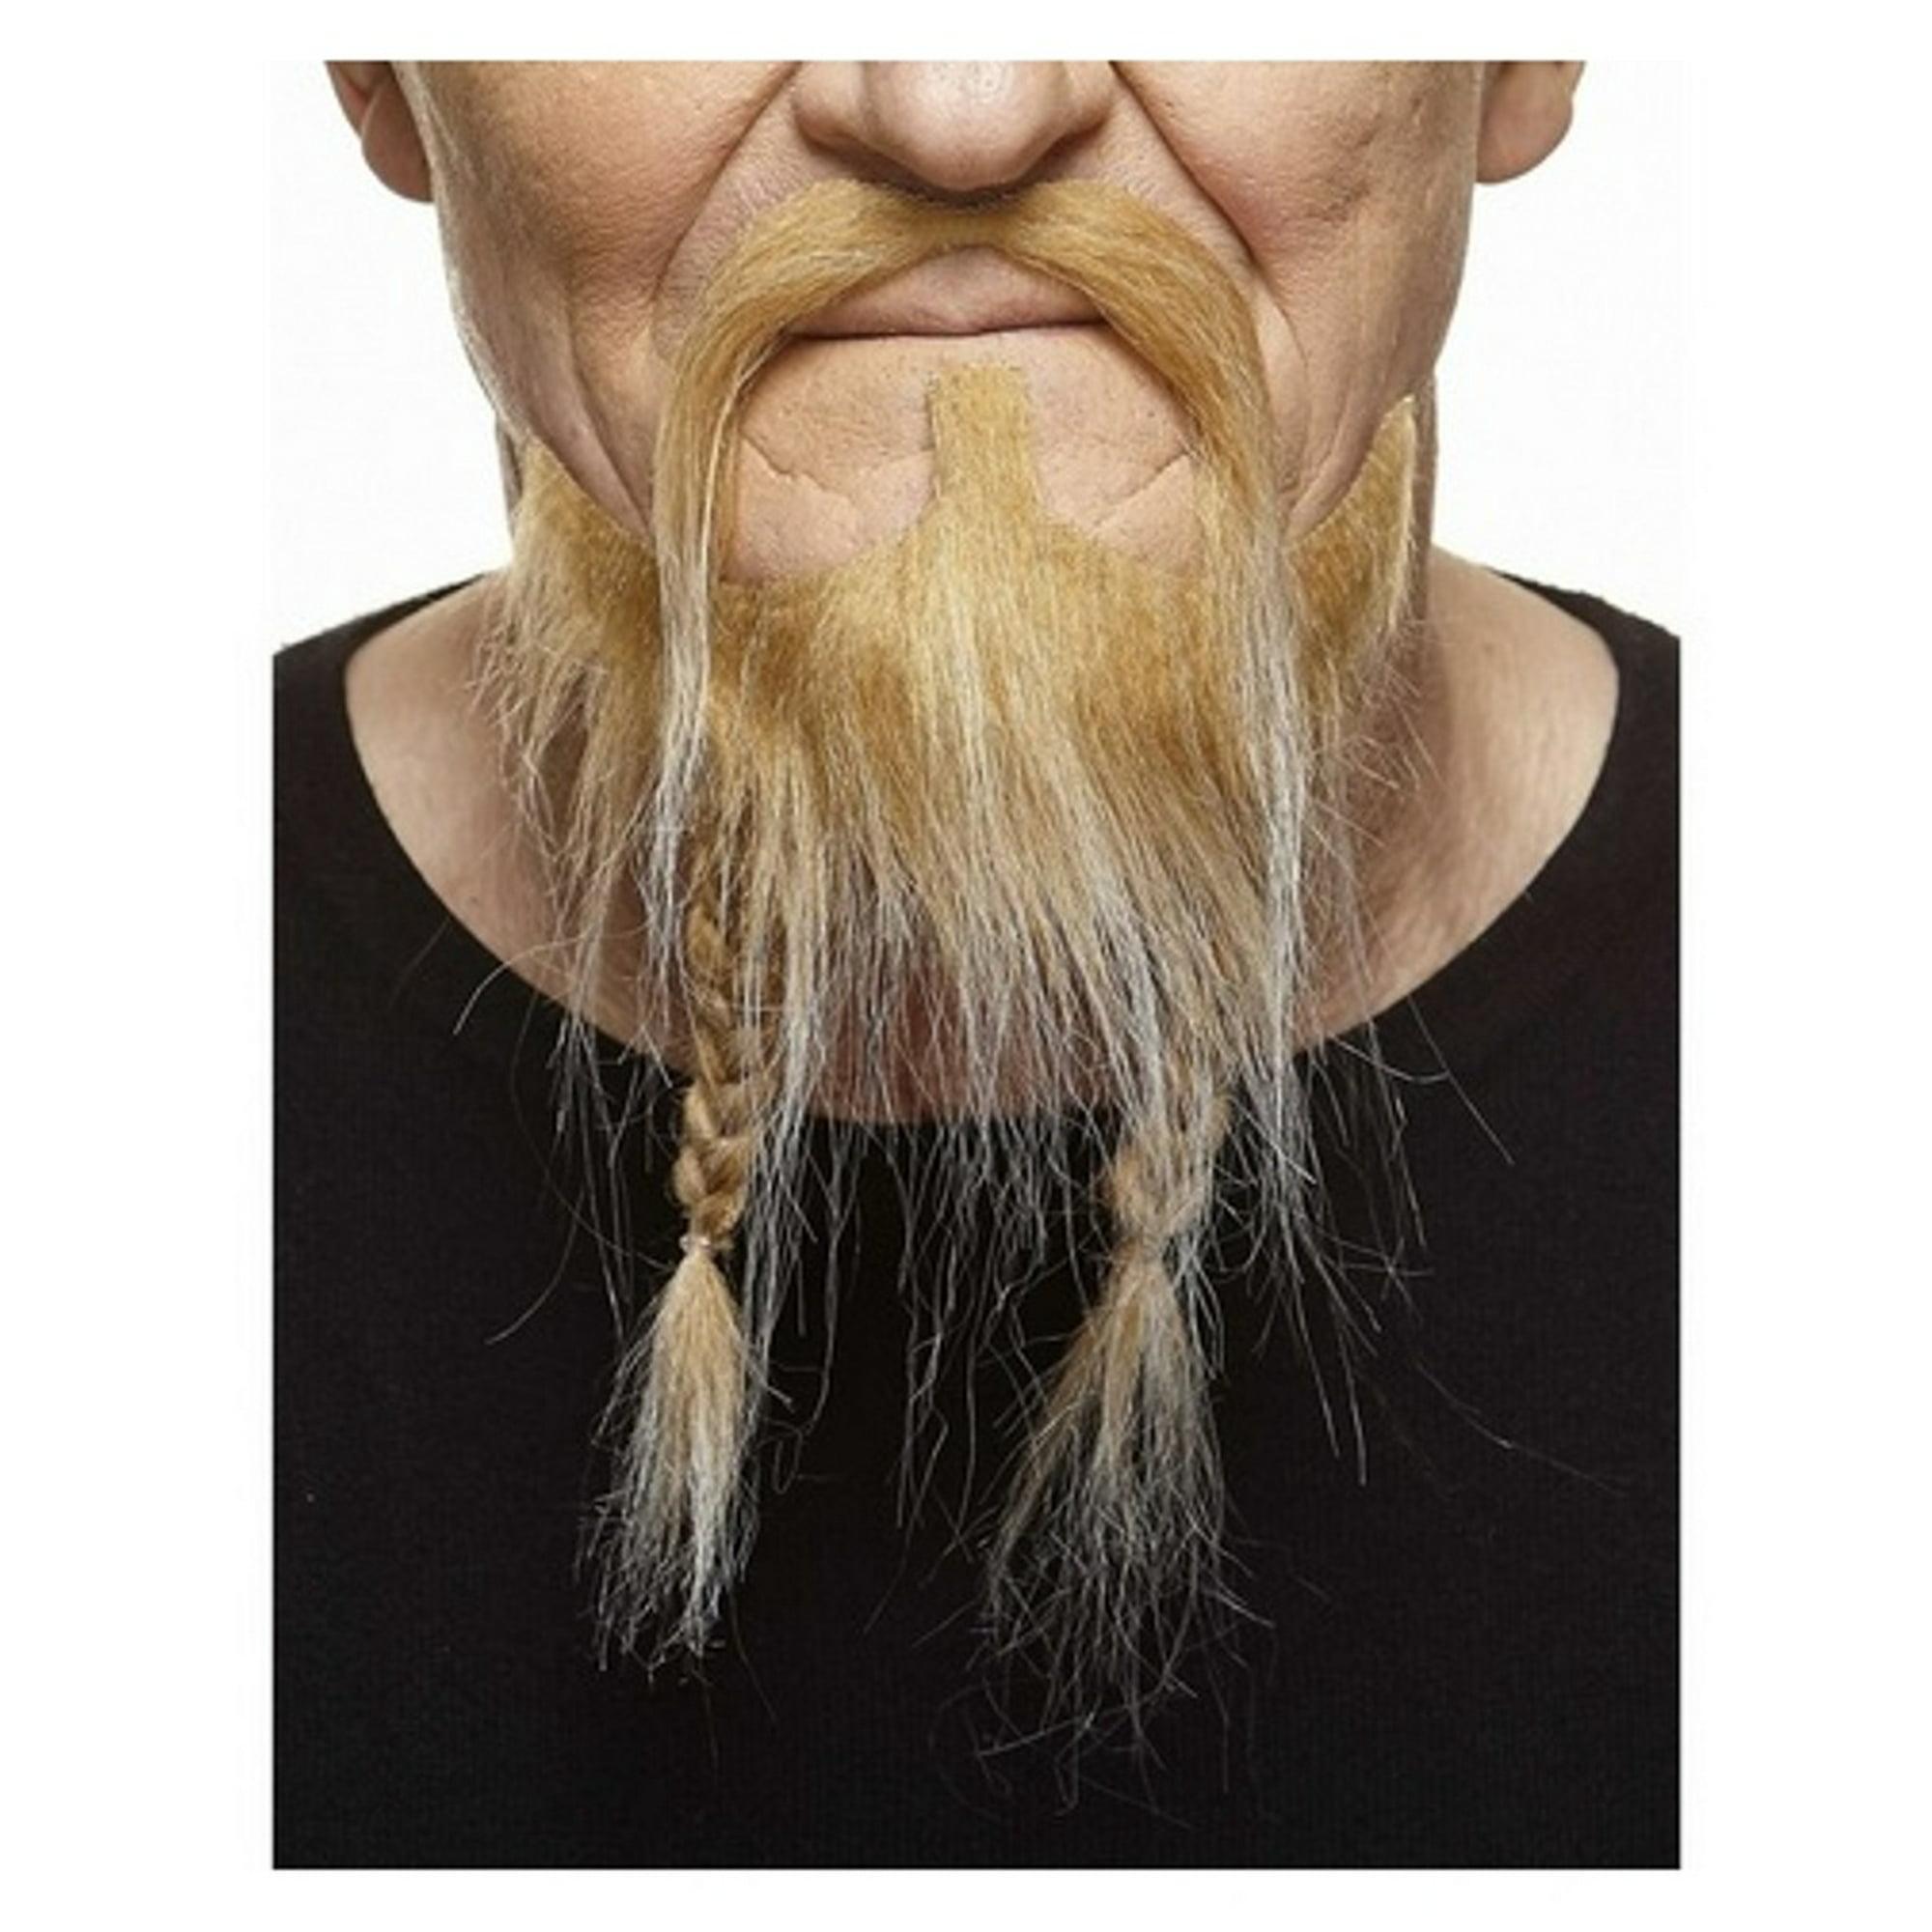 Blonde White Mustache Braided Beard Set 3m Viking Self Adhesive Facial Hair Mens Walmart Canada